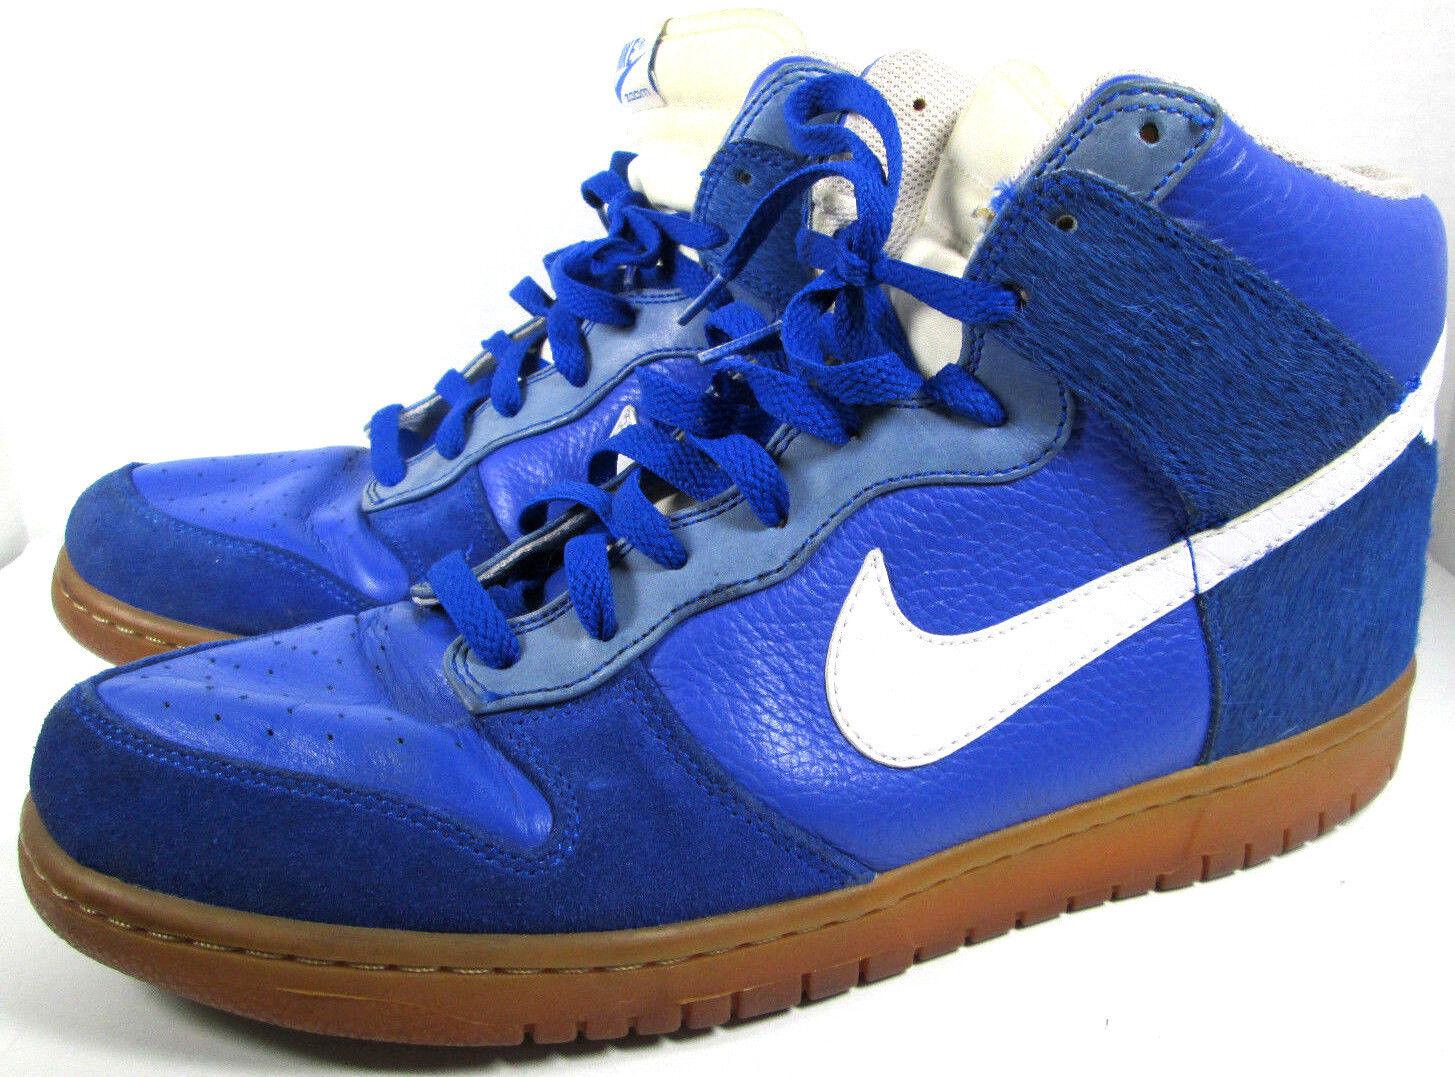 Nike Zoom Dunk Premium Horsehair Gum Soles bluee White Basketball Hightops Sz 12